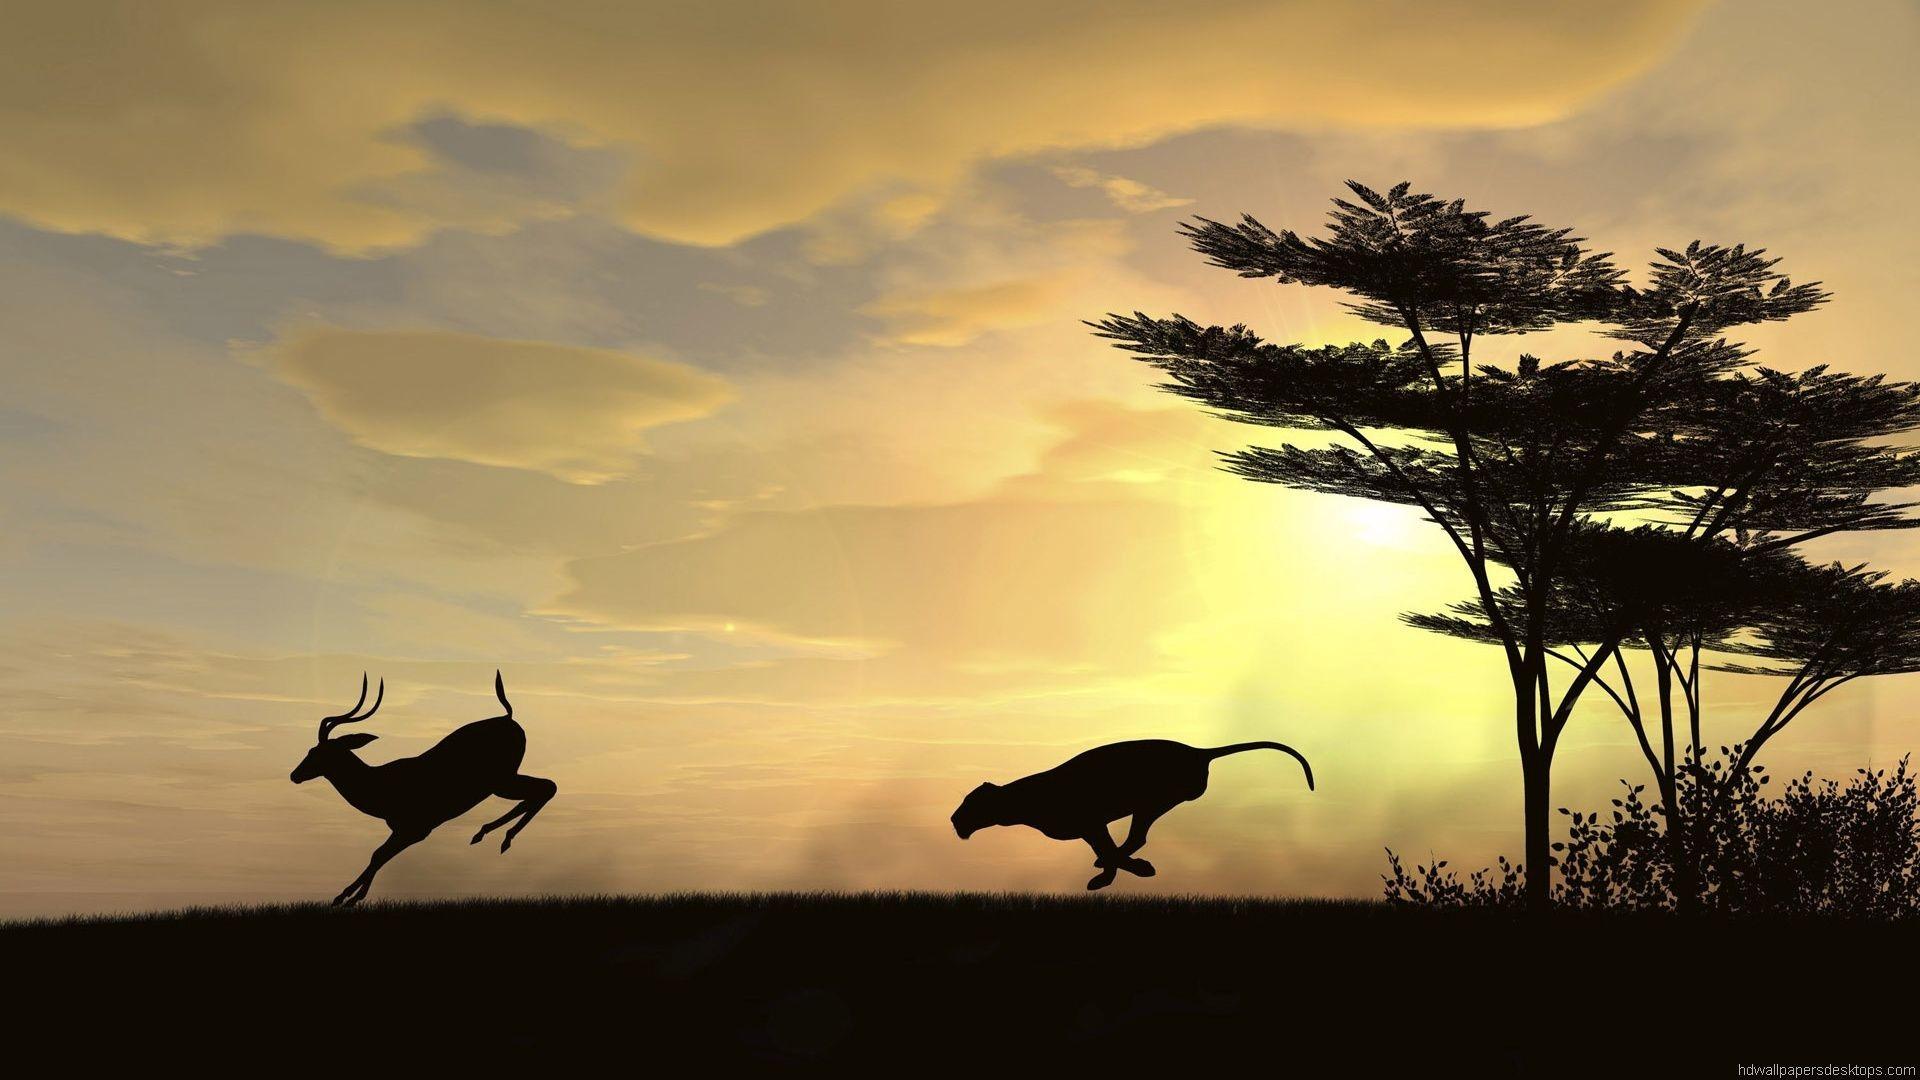 Collection Of Best Animal Wallpapers: Animal Desktop Wallpaper (69+ Images